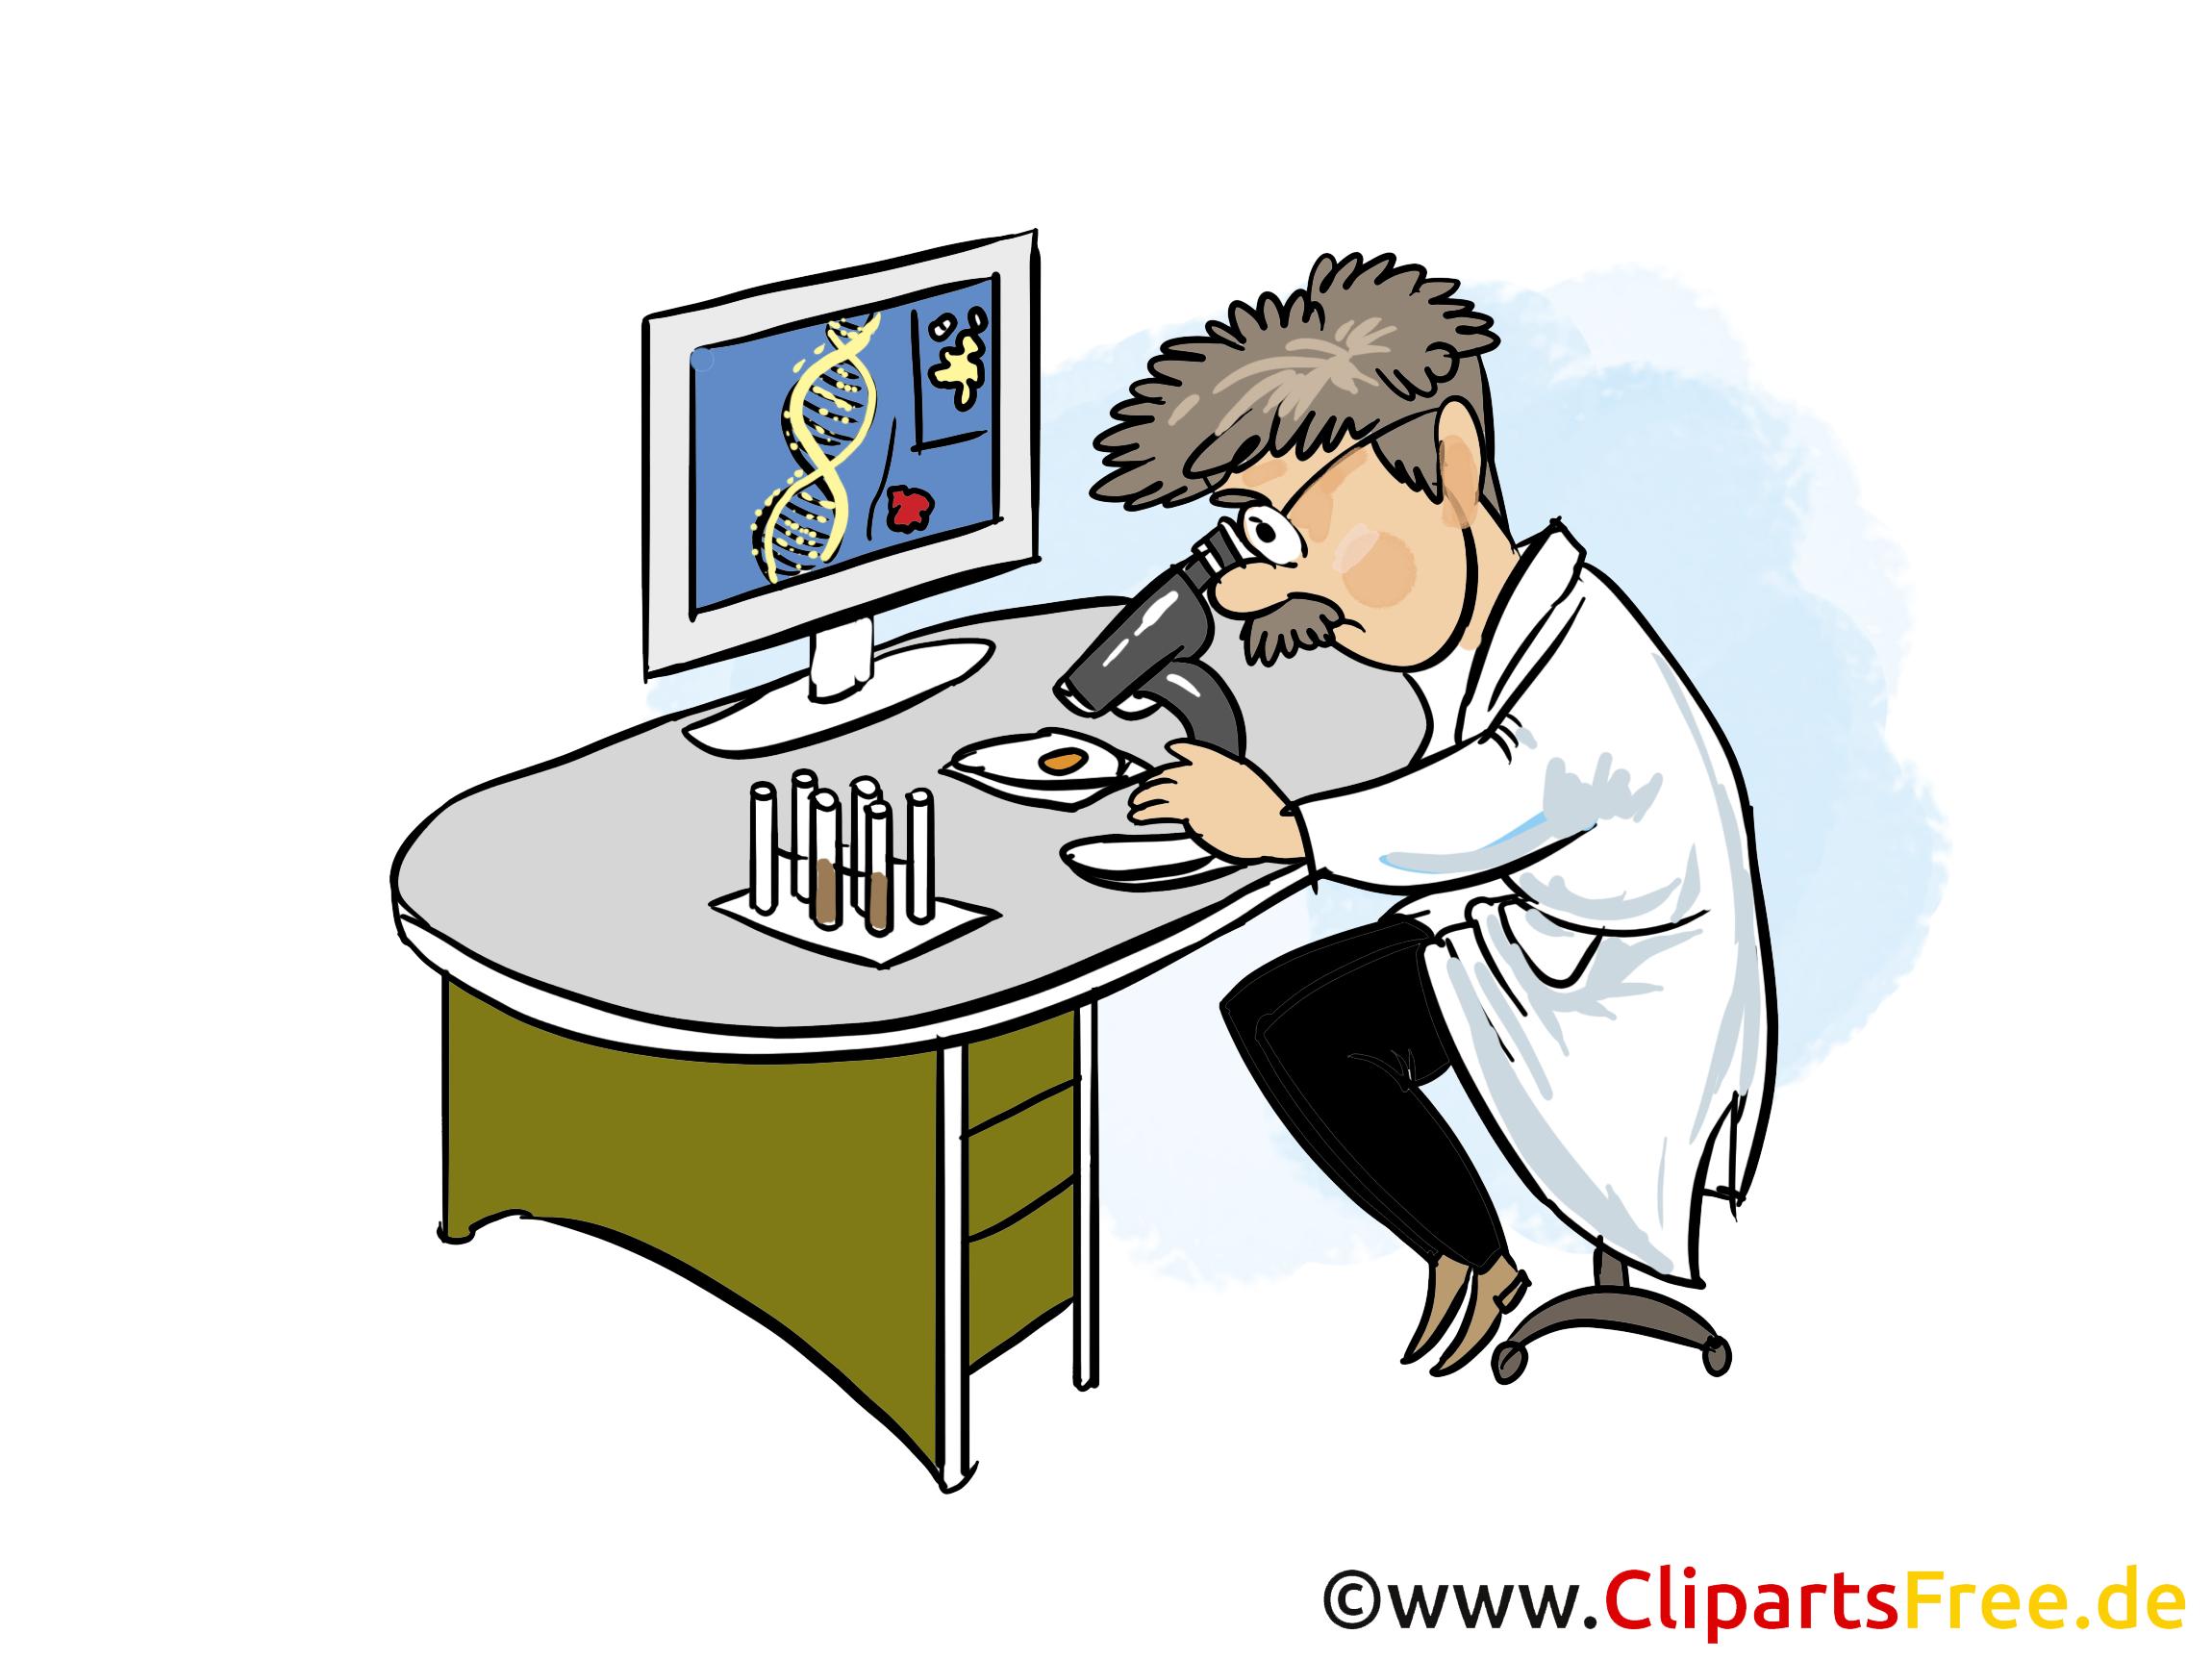 labor clipart  bild  cartoon  grafik forced labor clipart clipart labor day